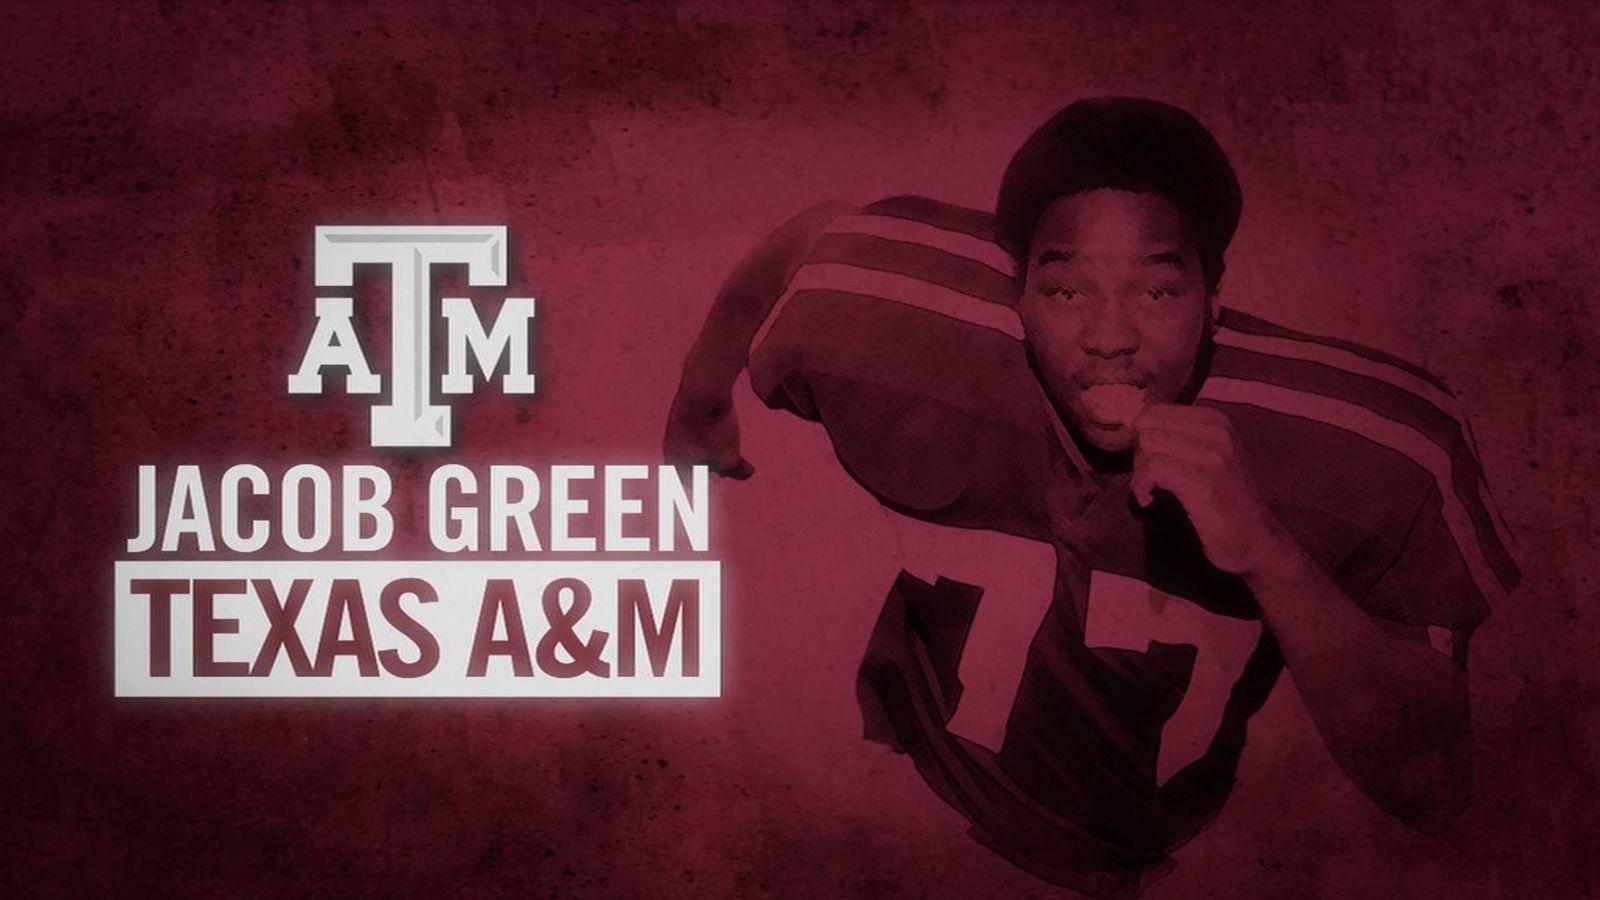 SEC celebrates Black History Month: Texas A&M